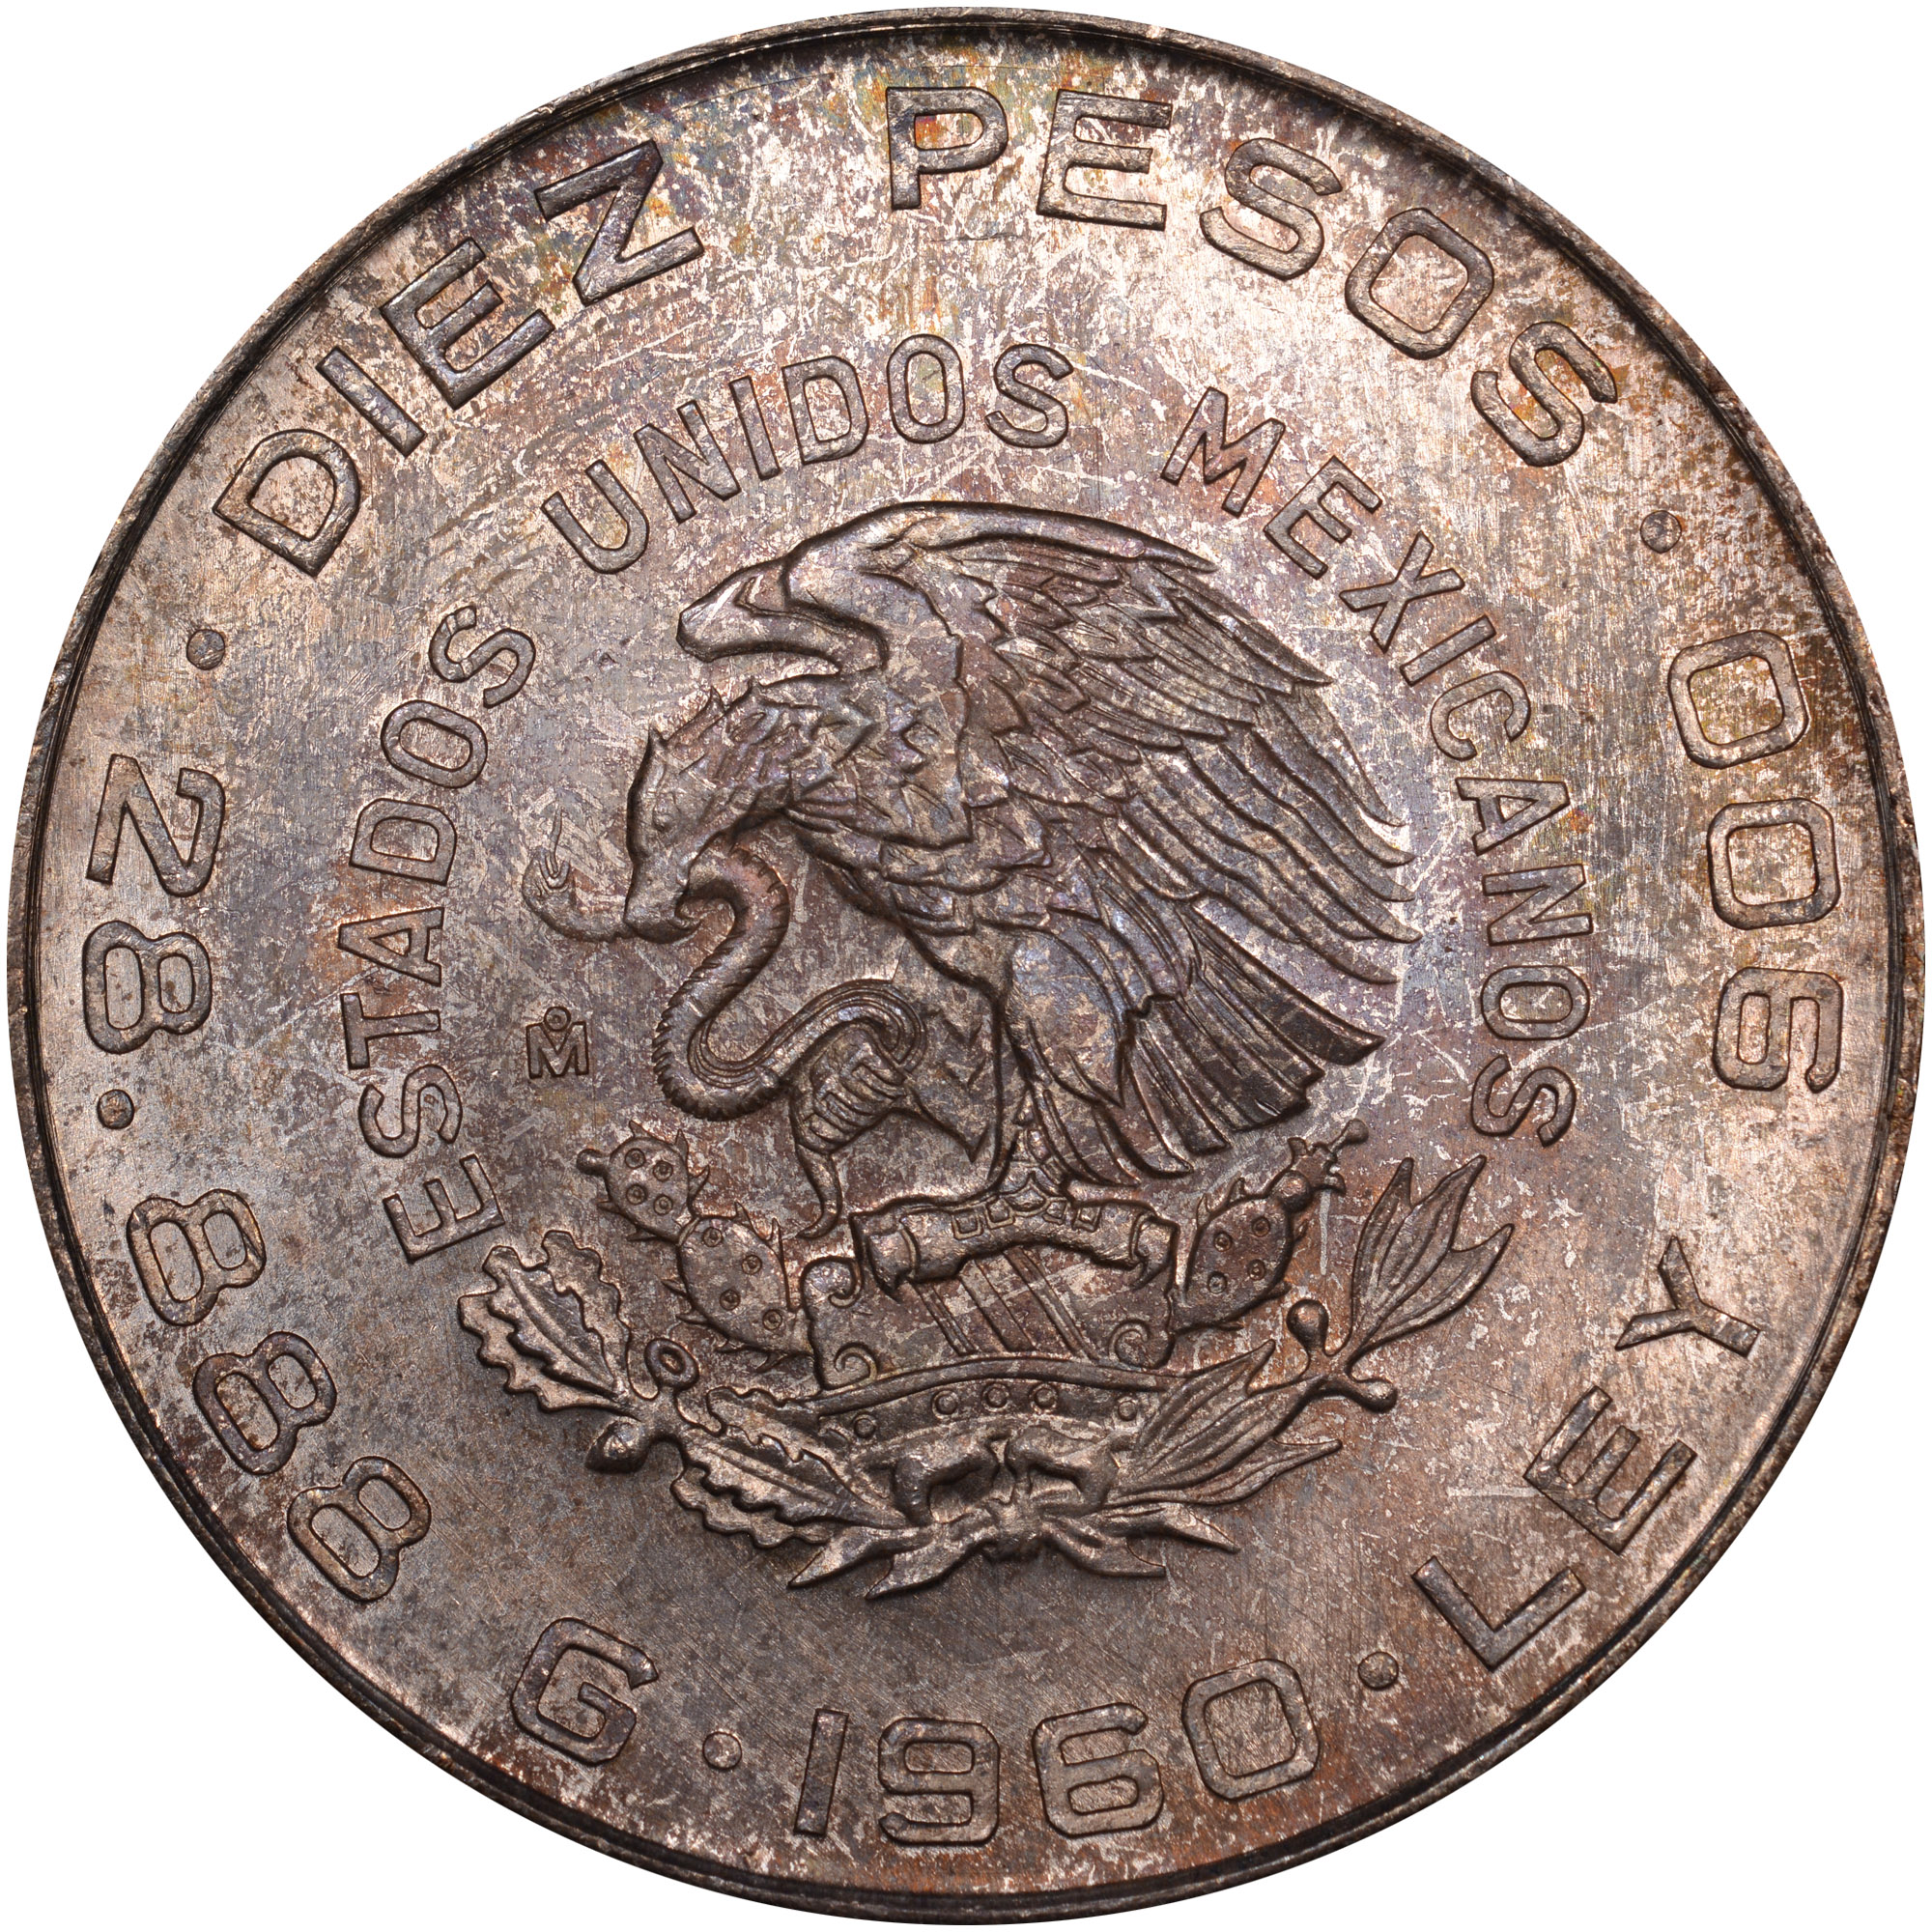 1960 Mexico 10 Pesos obverse